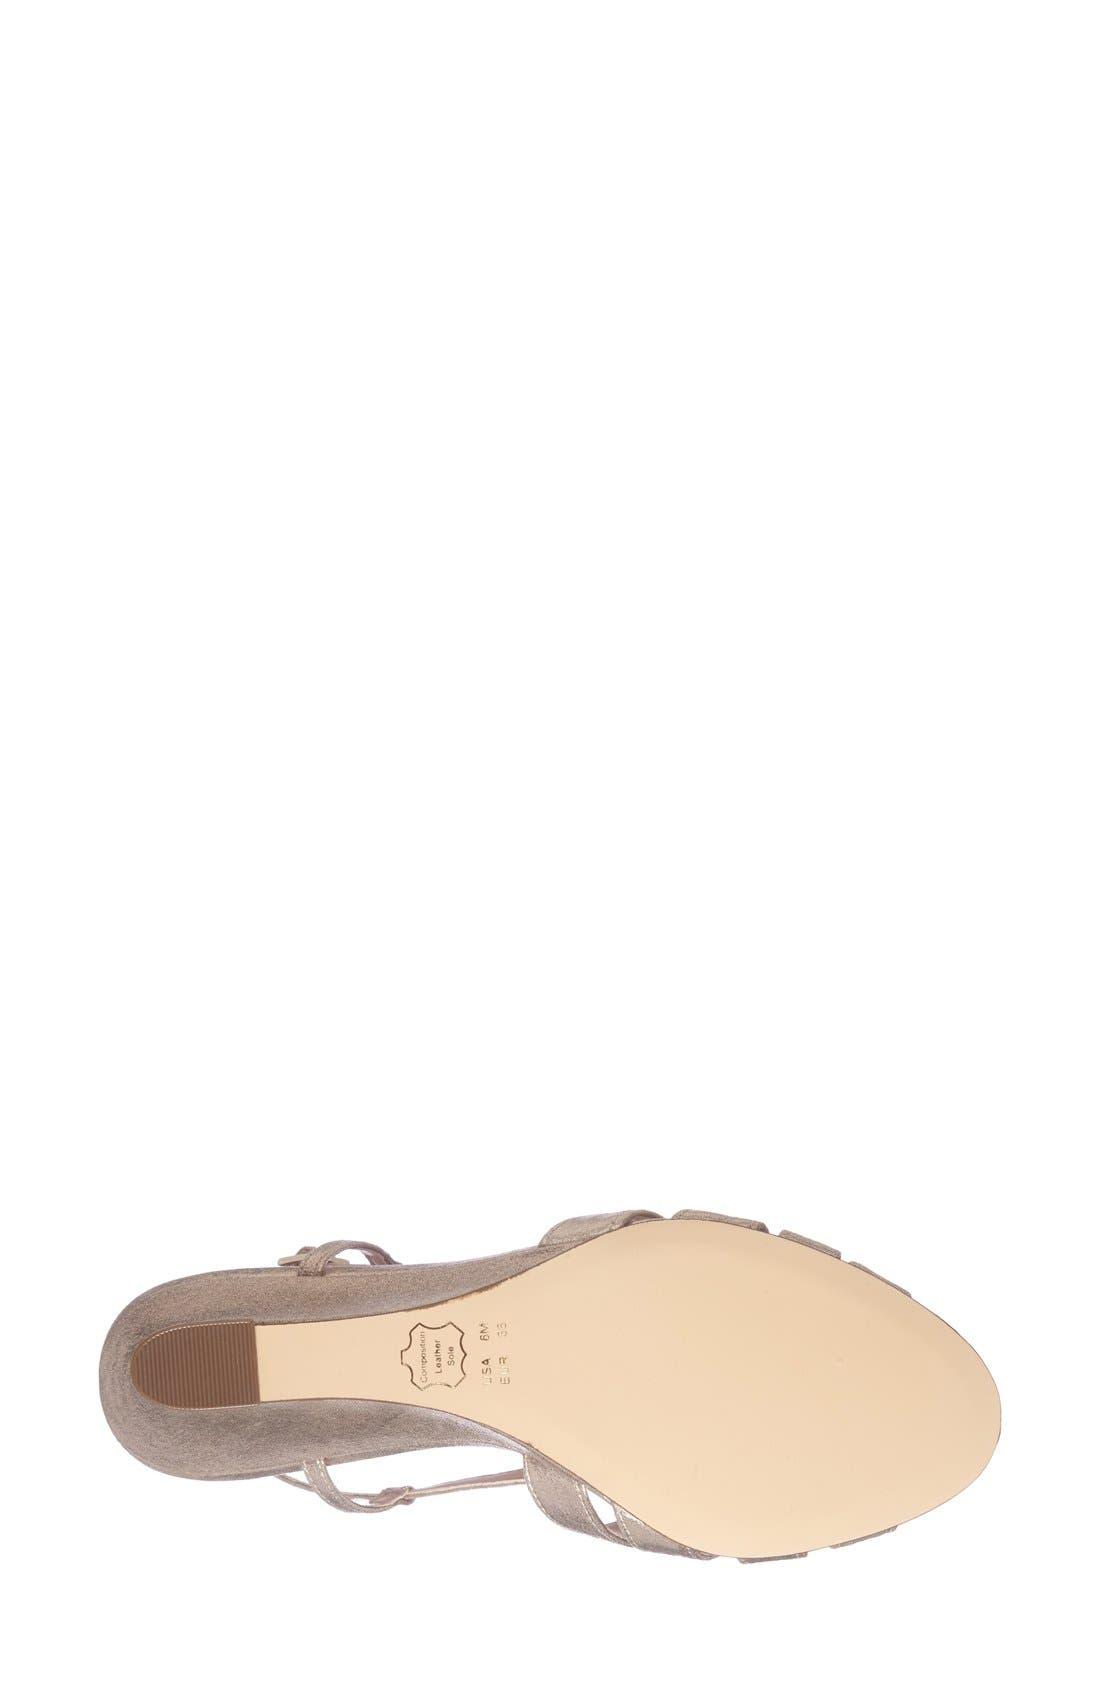 'Voleta' Wedge Sandal,                             Alternate thumbnail 4, color,                             Taupe